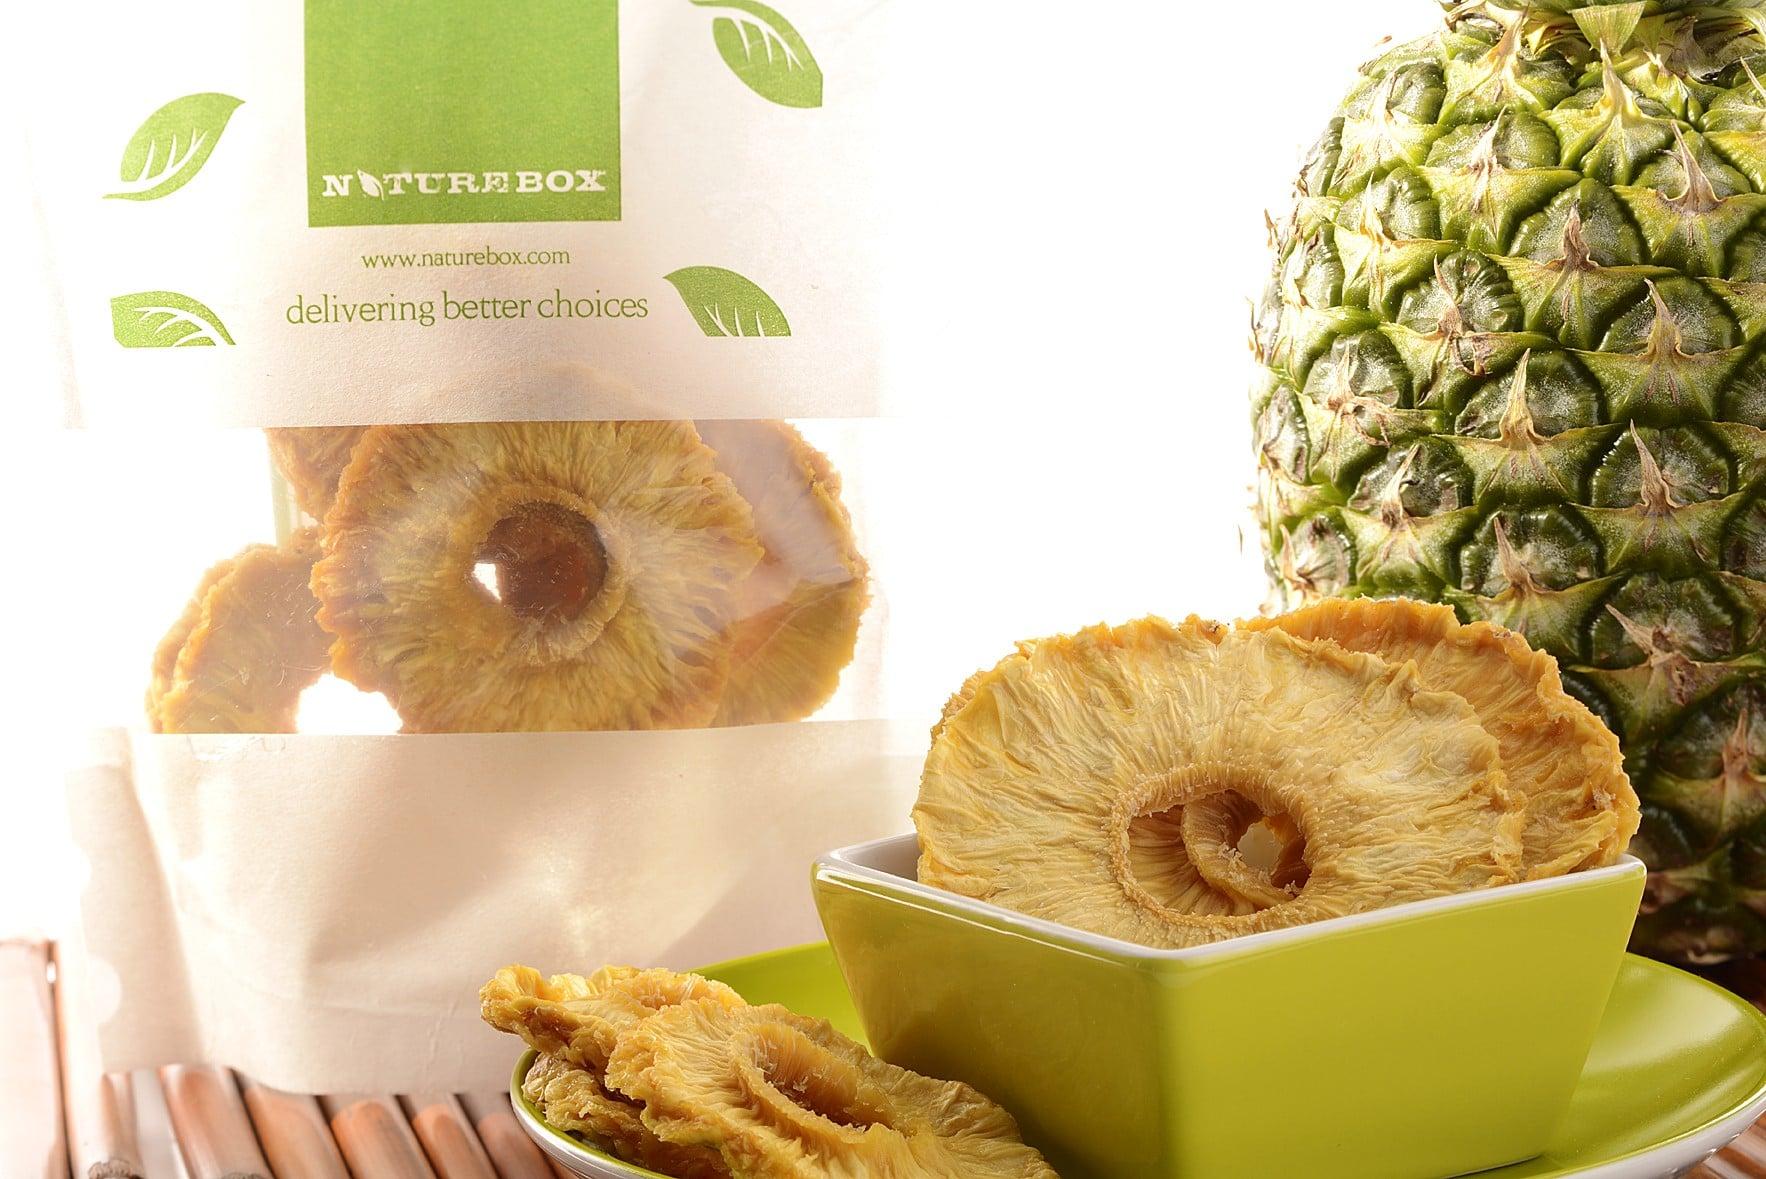 NatureBox Pineapple Rings